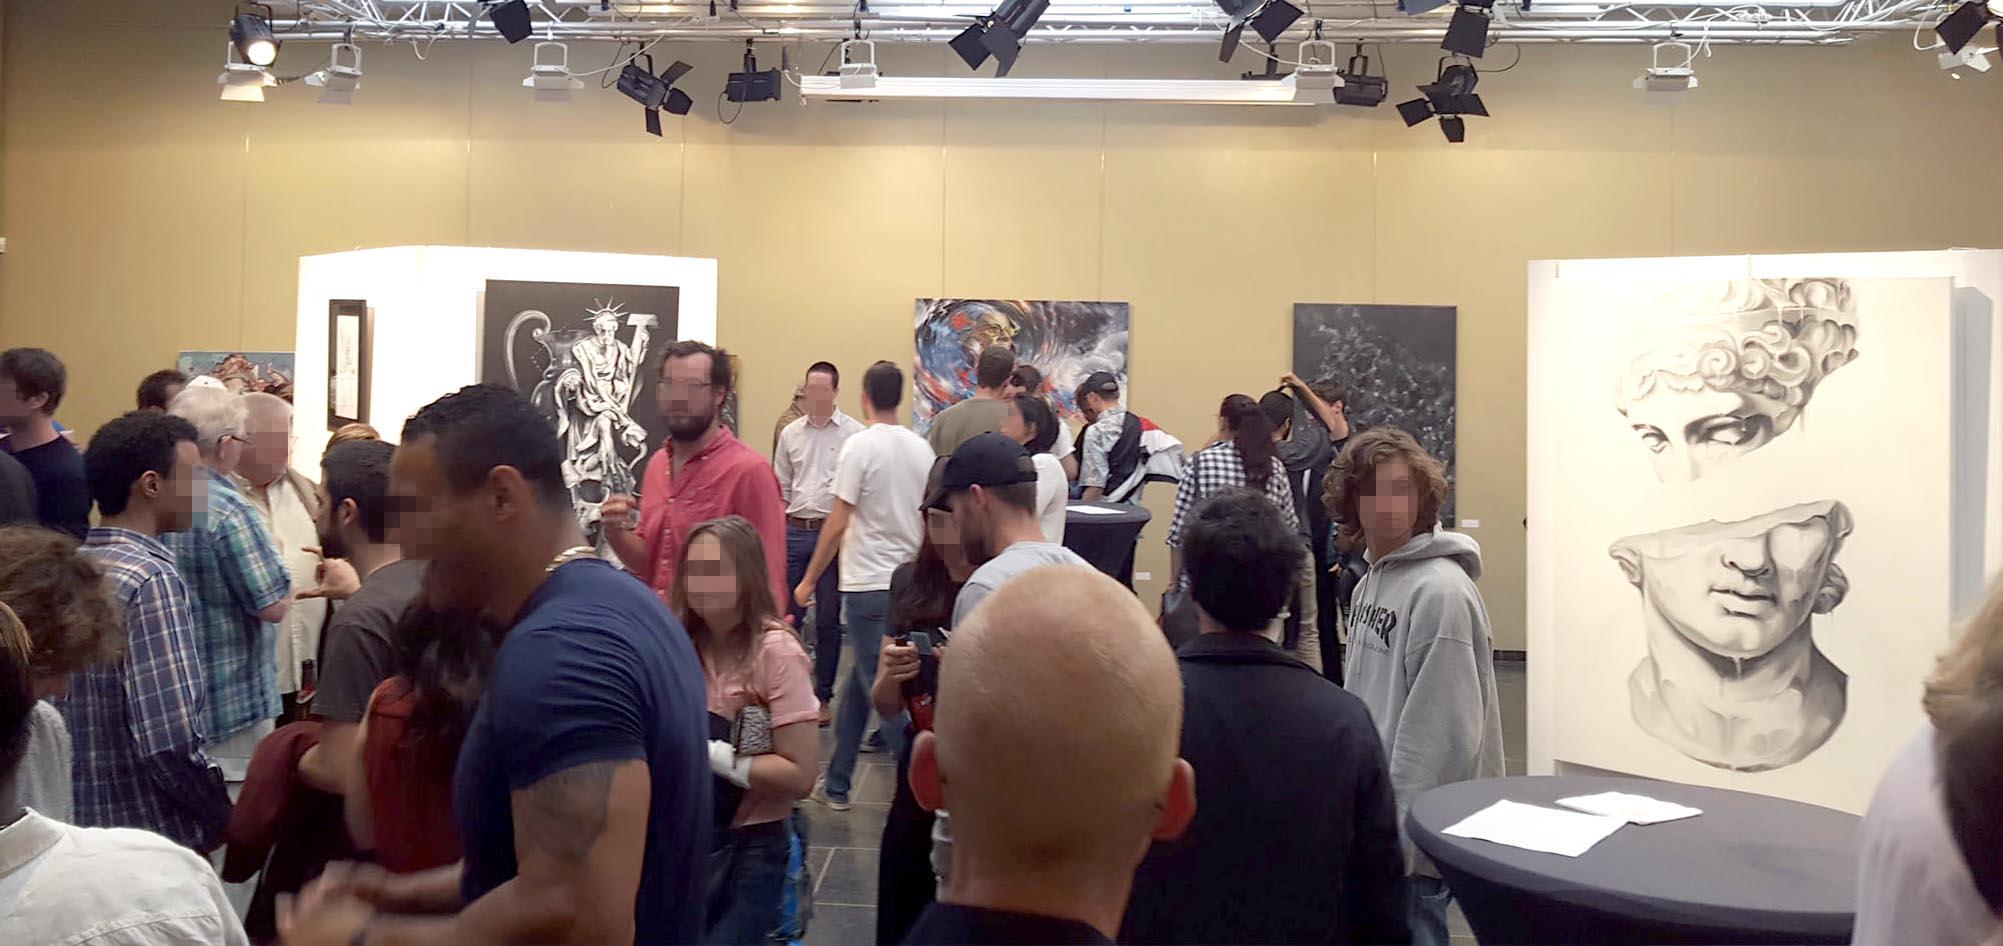 https://www.propaganza.be/wp-content/uploads/2015/09/propaganza-urban-artist-graffiti-graff-street-art-spray-painting-belgique-vapors-expo-exhibition-uccle-ccu-2017-1.jpg